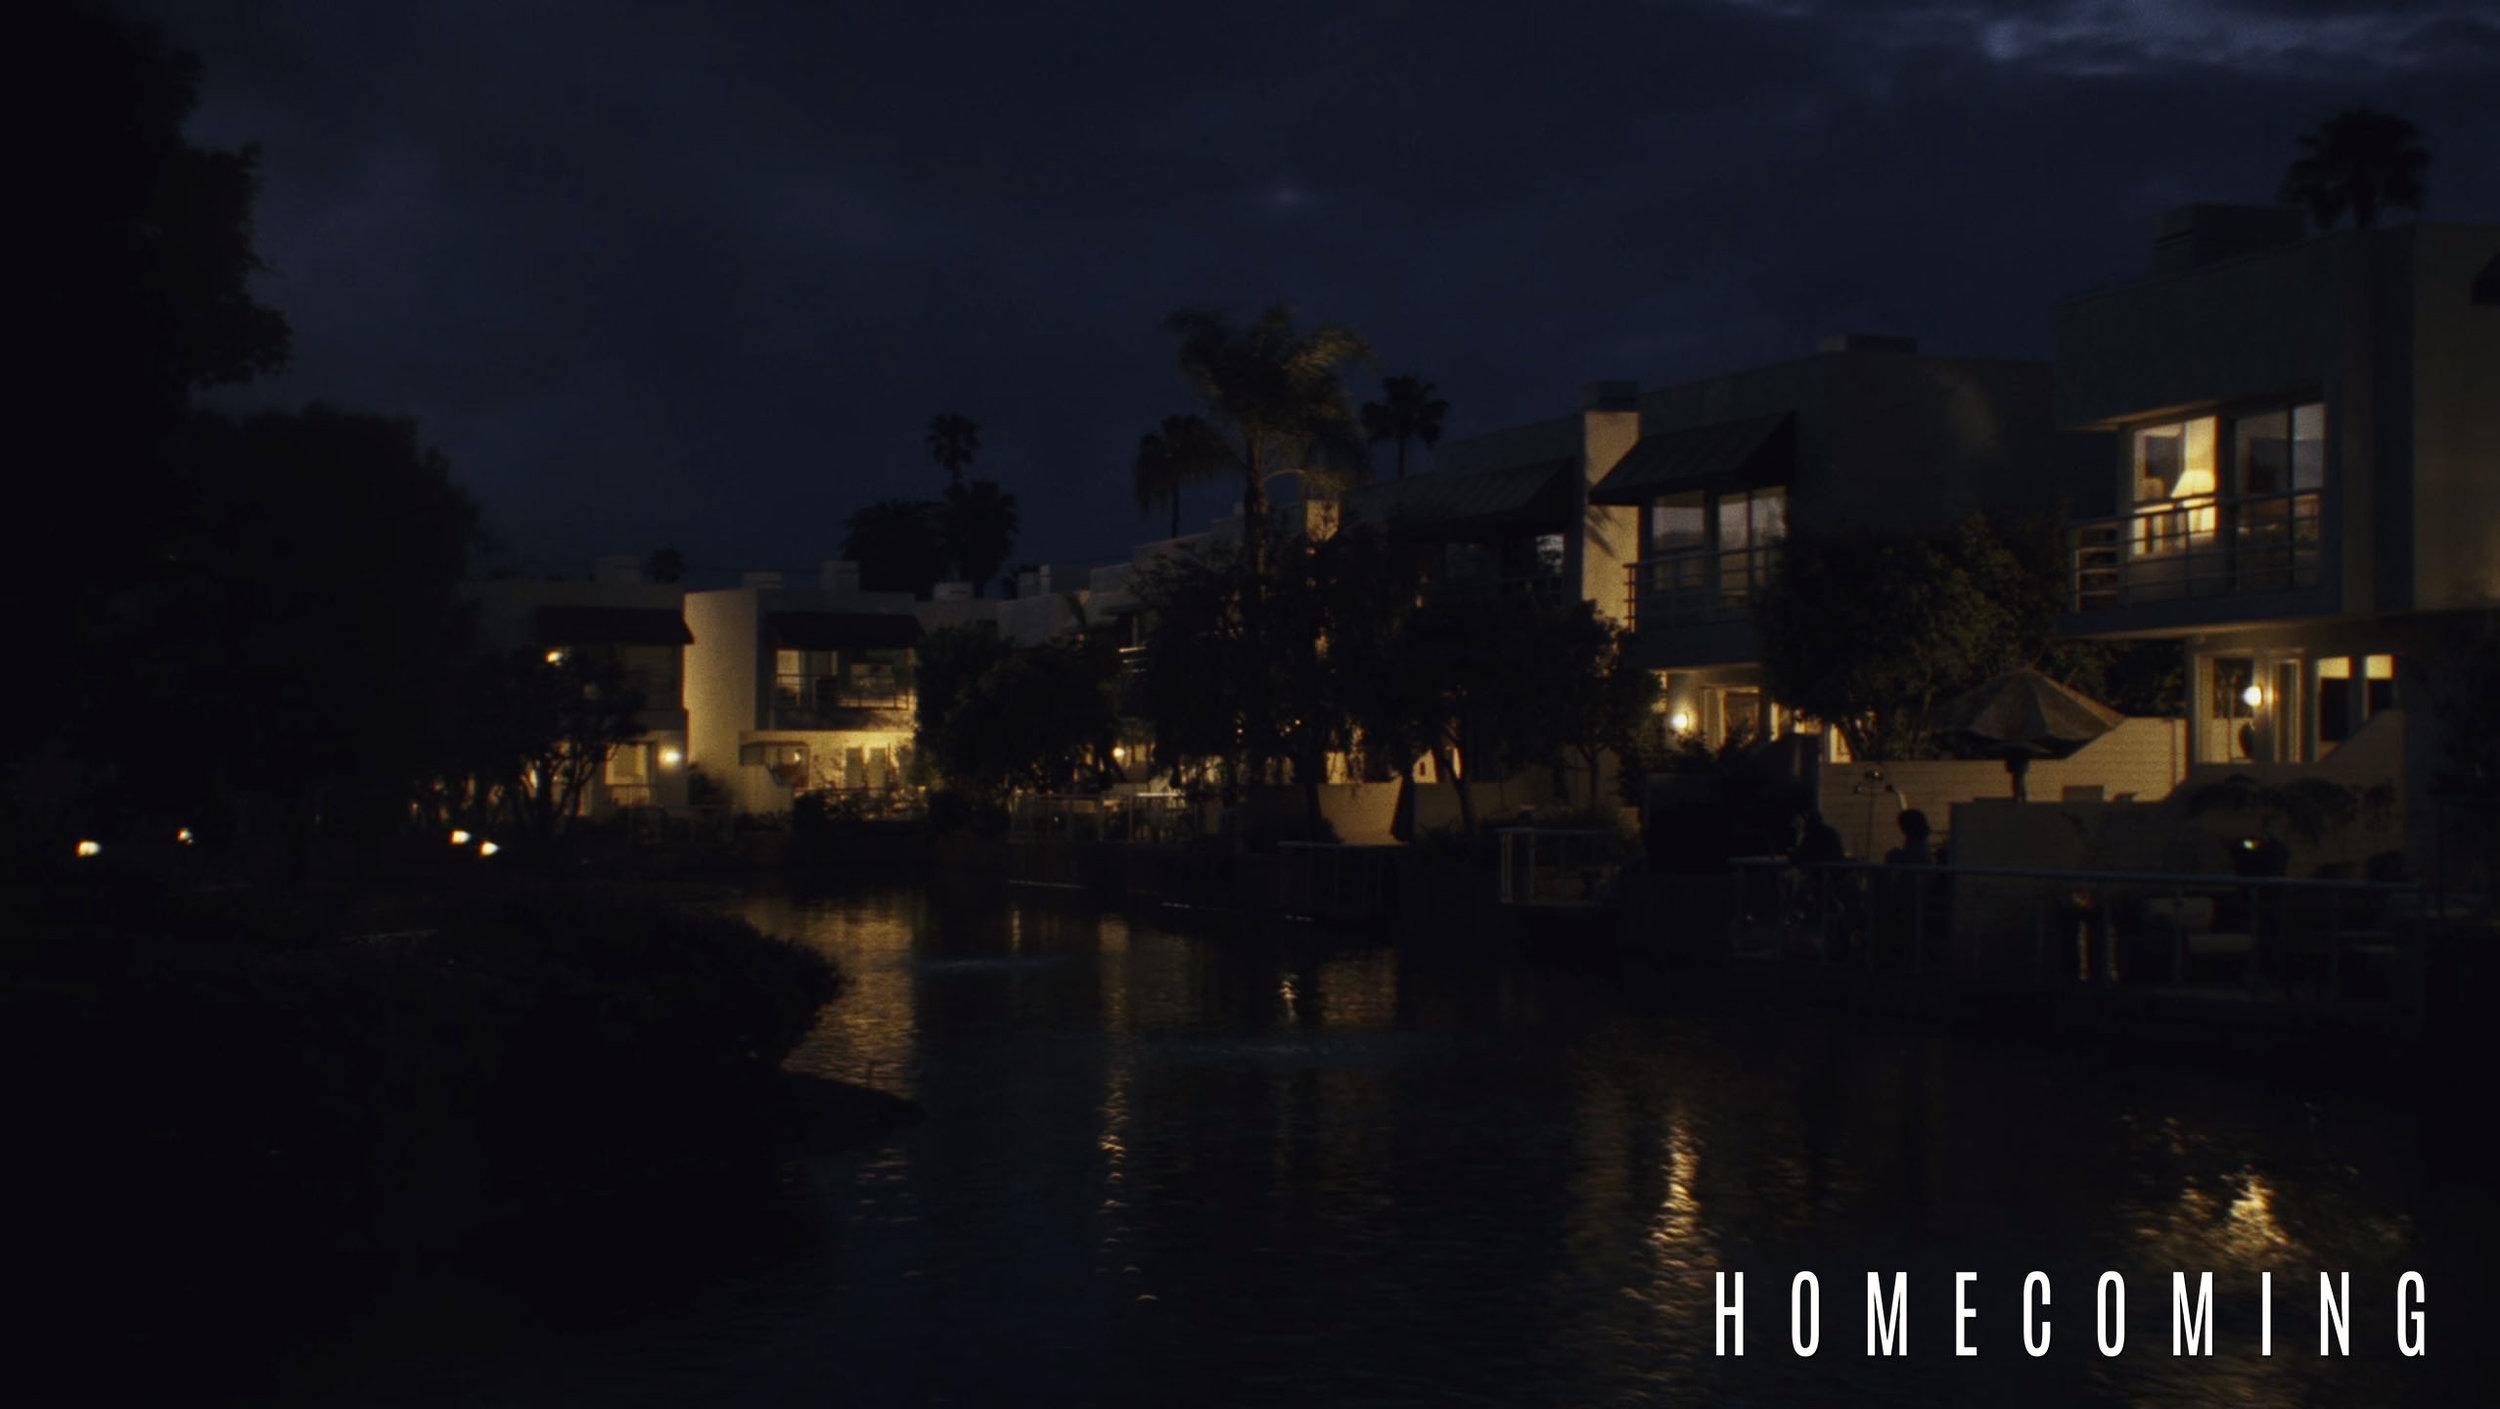 Homecoming 1046.jpg